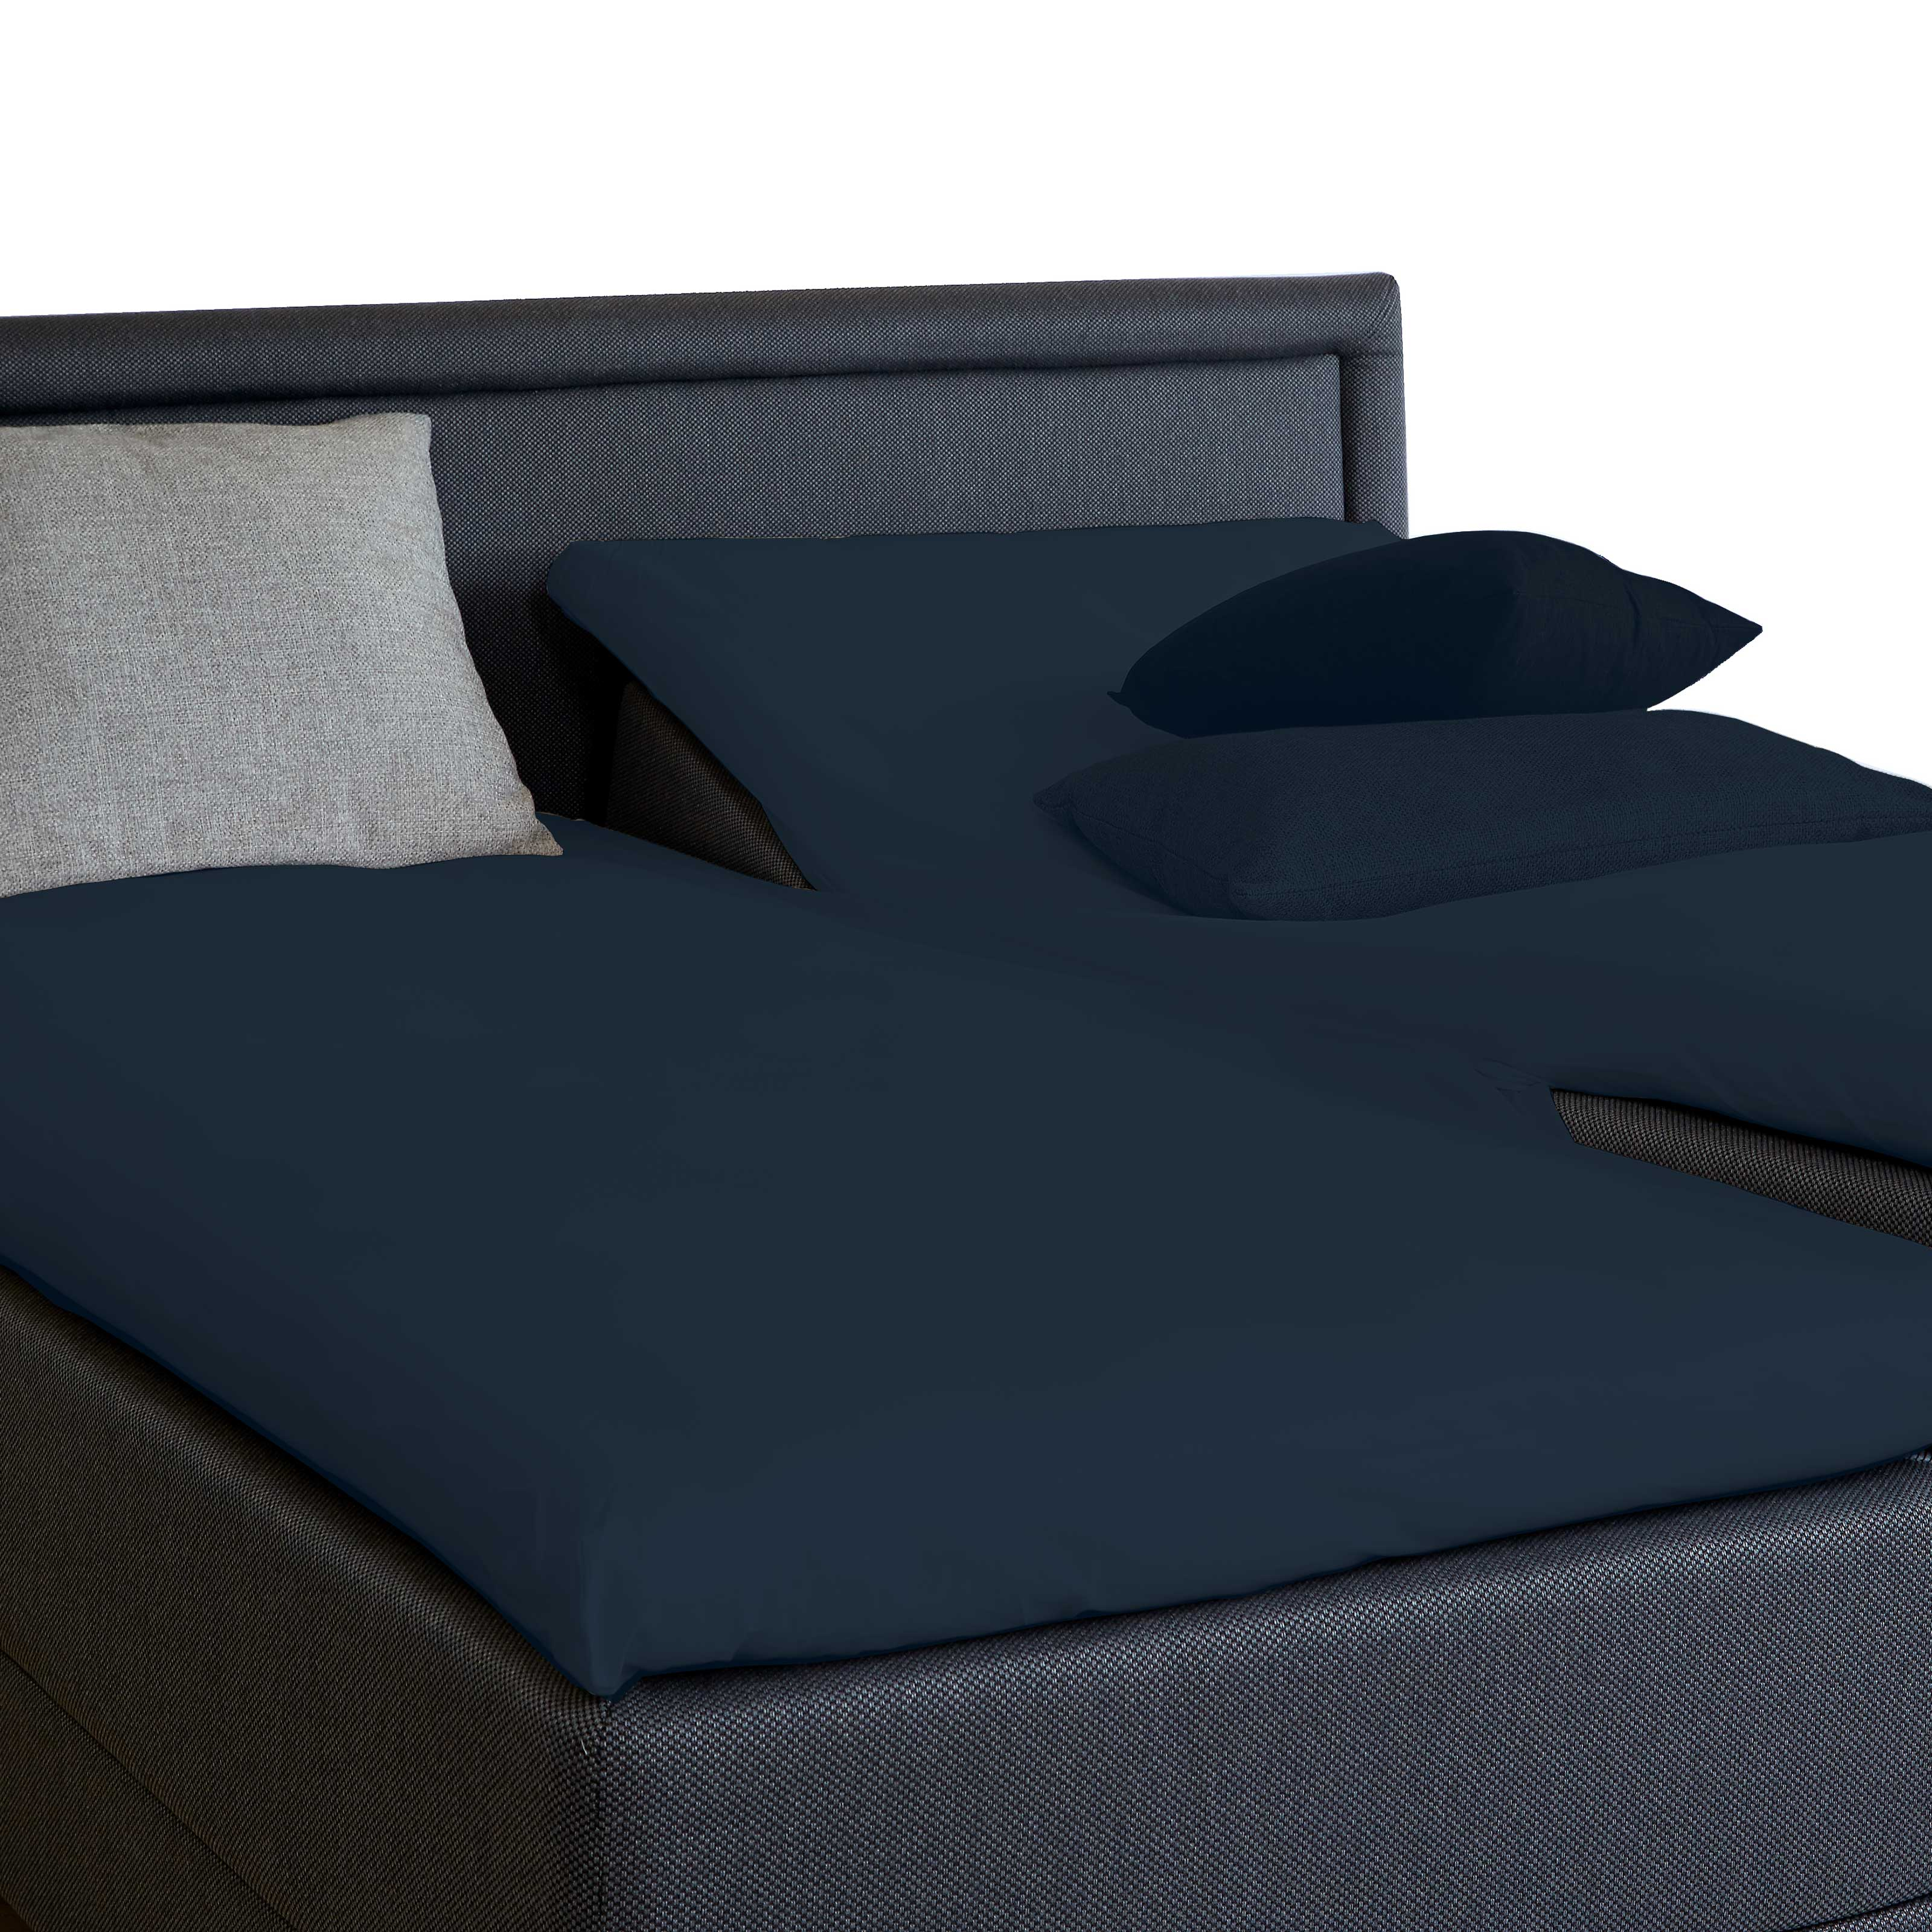 Image of   Unikka kuvertlagen H 180x210x10 cm mørkeblå/bomuld